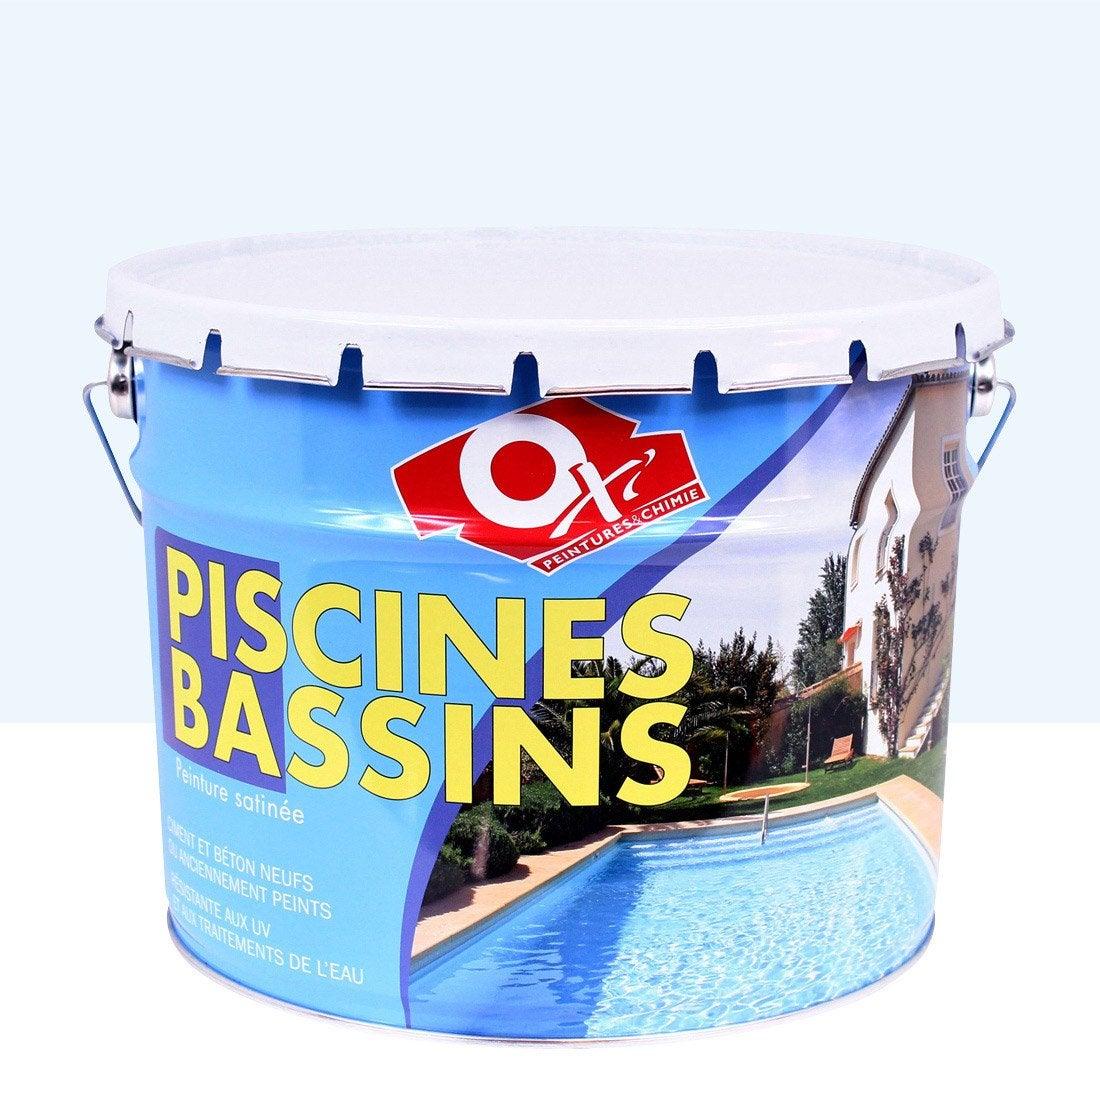 peinture piscine et bassin ext rieur oxytol bleu 10 l leroy merlin. Black Bedroom Furniture Sets. Home Design Ideas